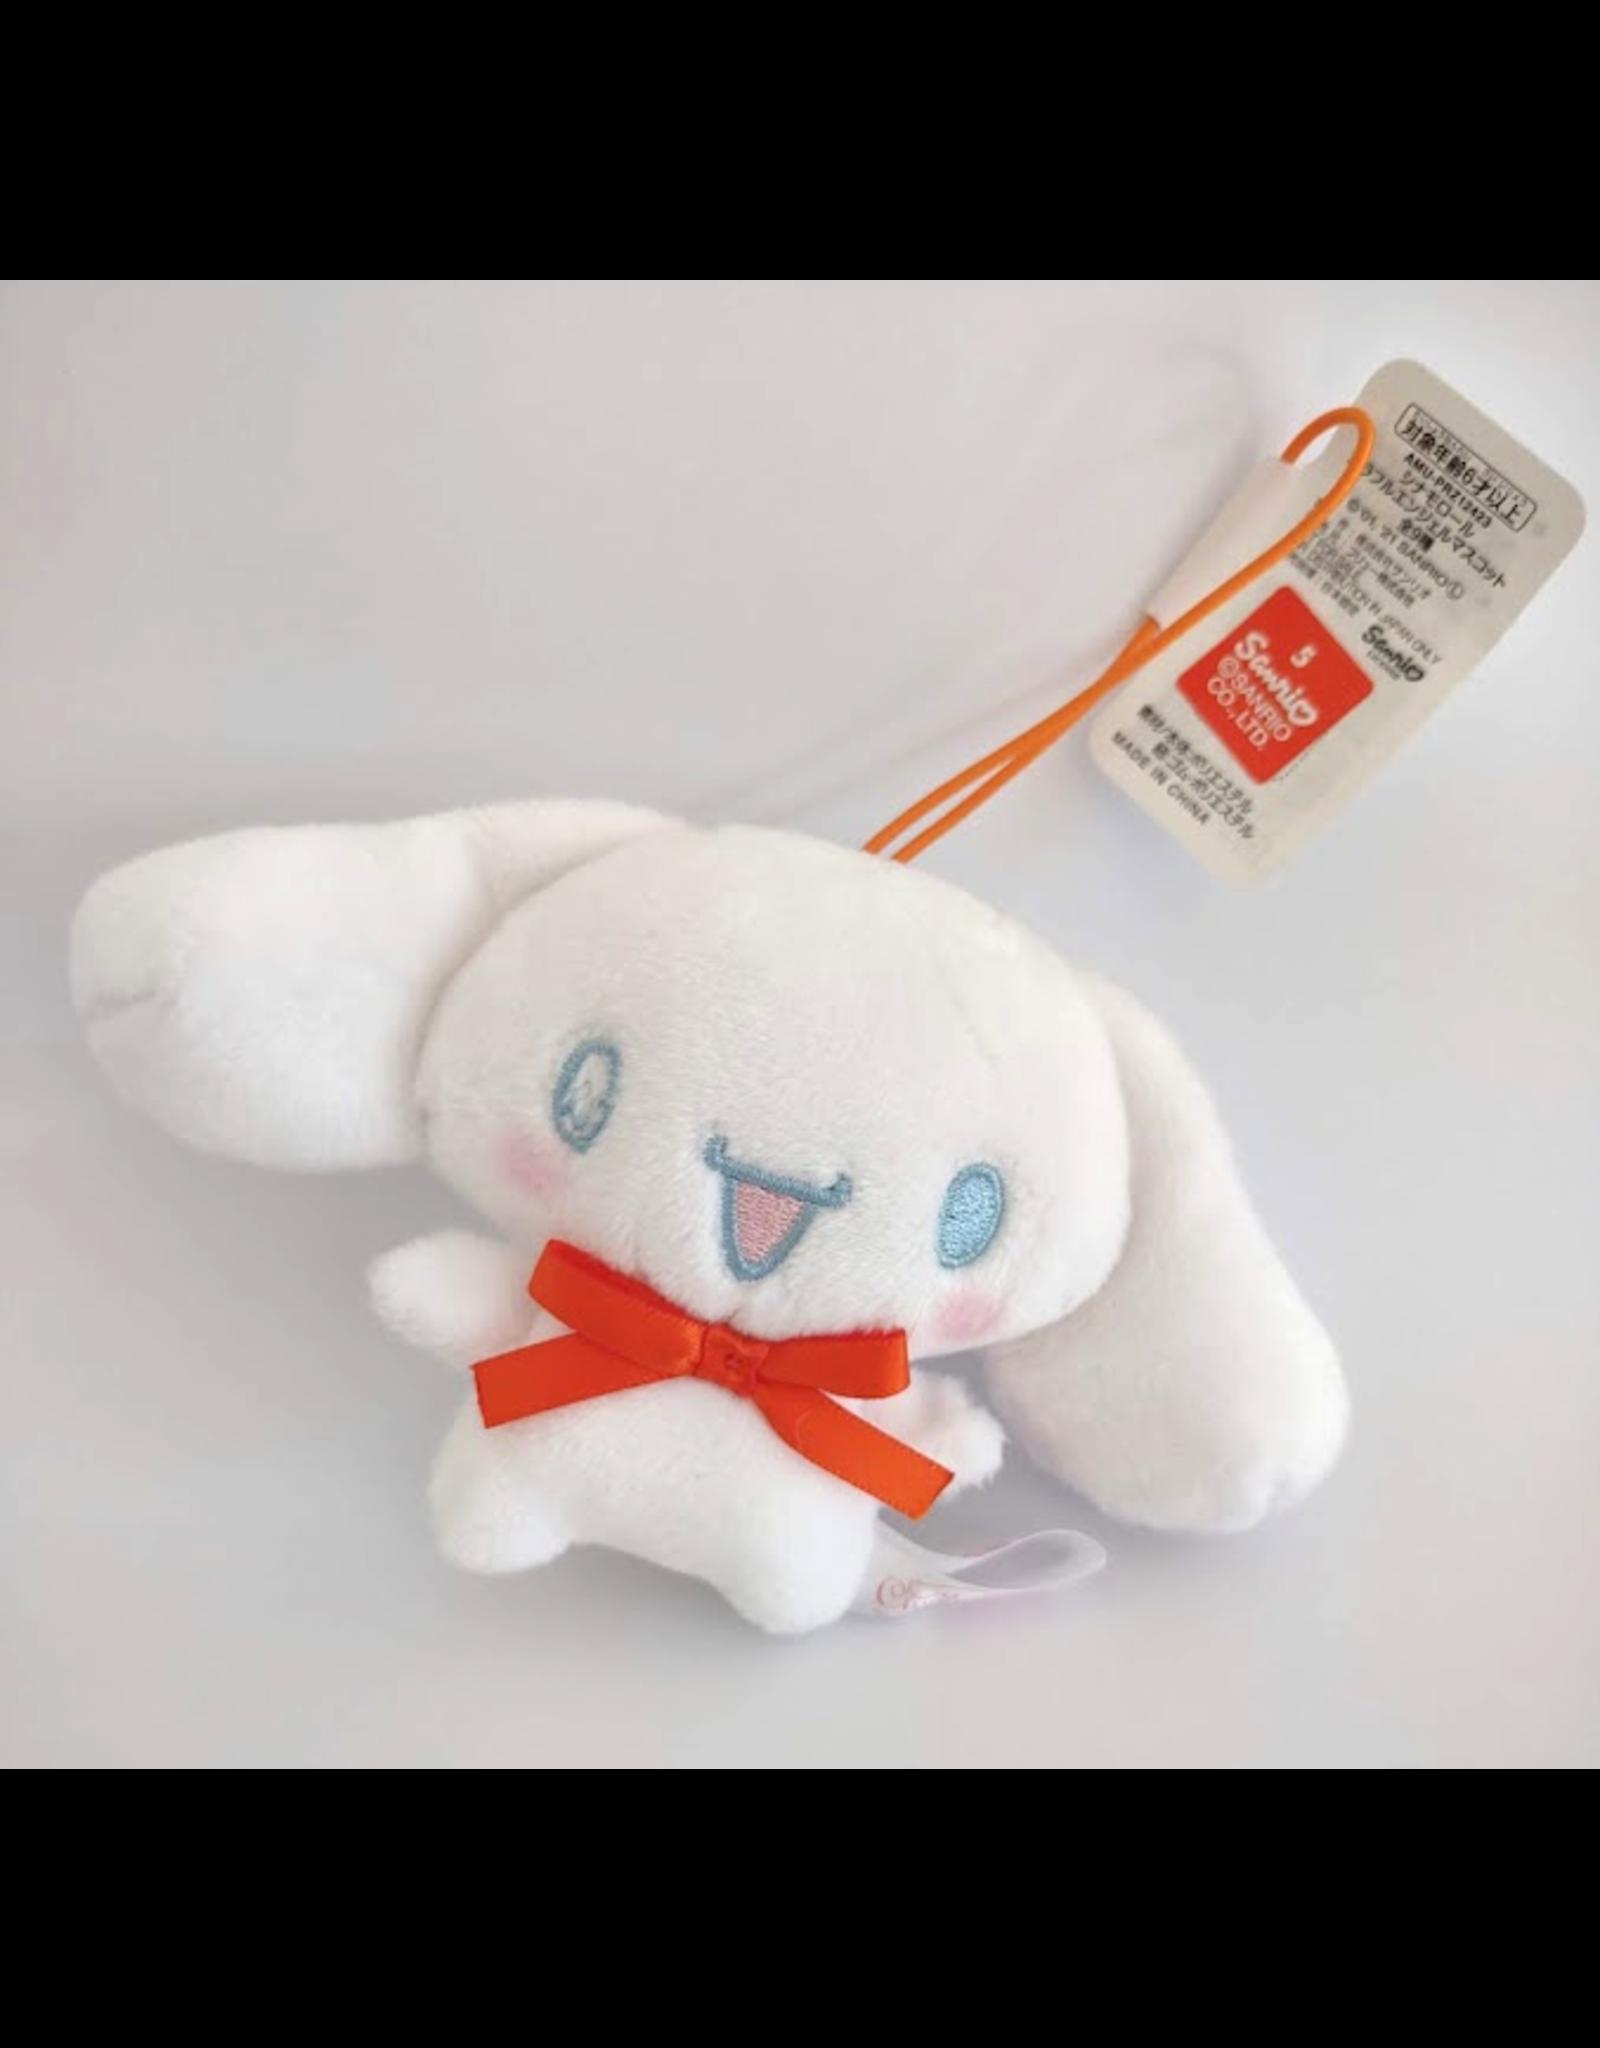 Sanrio Cinnamoroll - Colorful Angel Mascot Plush - 8 cm - Orange